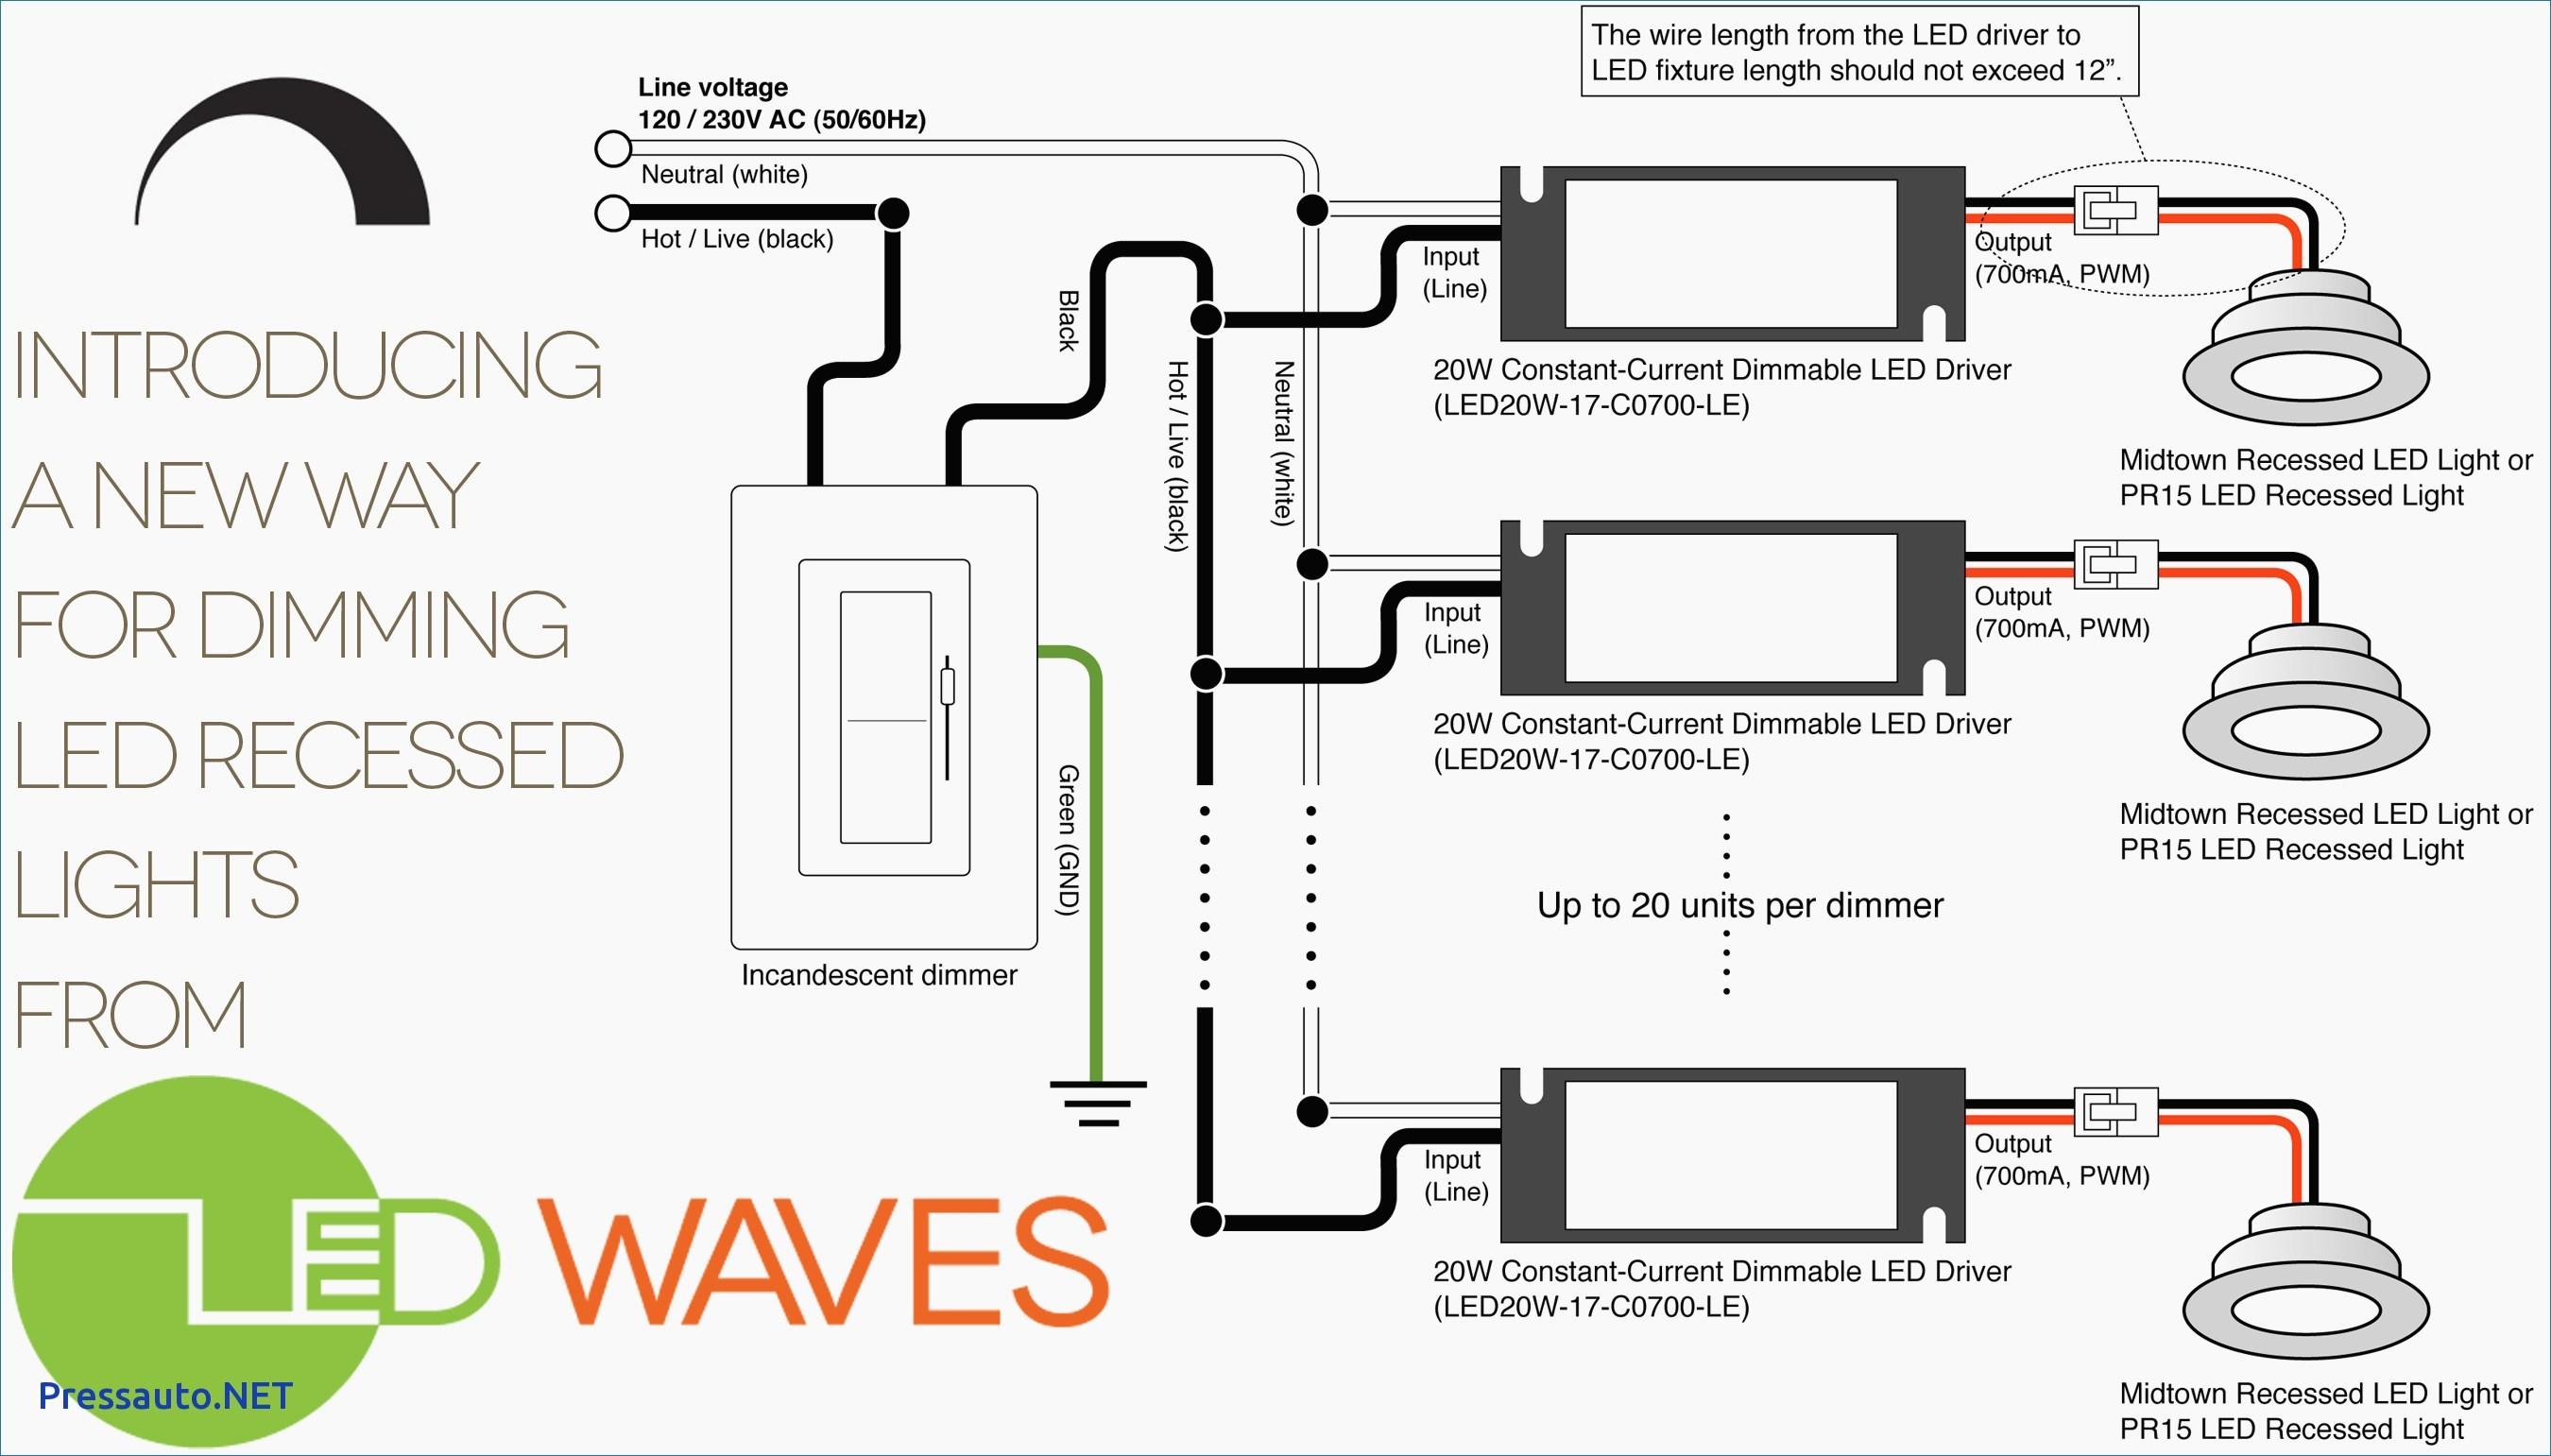 led driver wiring diagram mark 10v dimming ballasts wiring diagram rh detoxicrecenze com Dimming Ballast Wiring Diagram Lutron Dimmer Wiring-Diagram